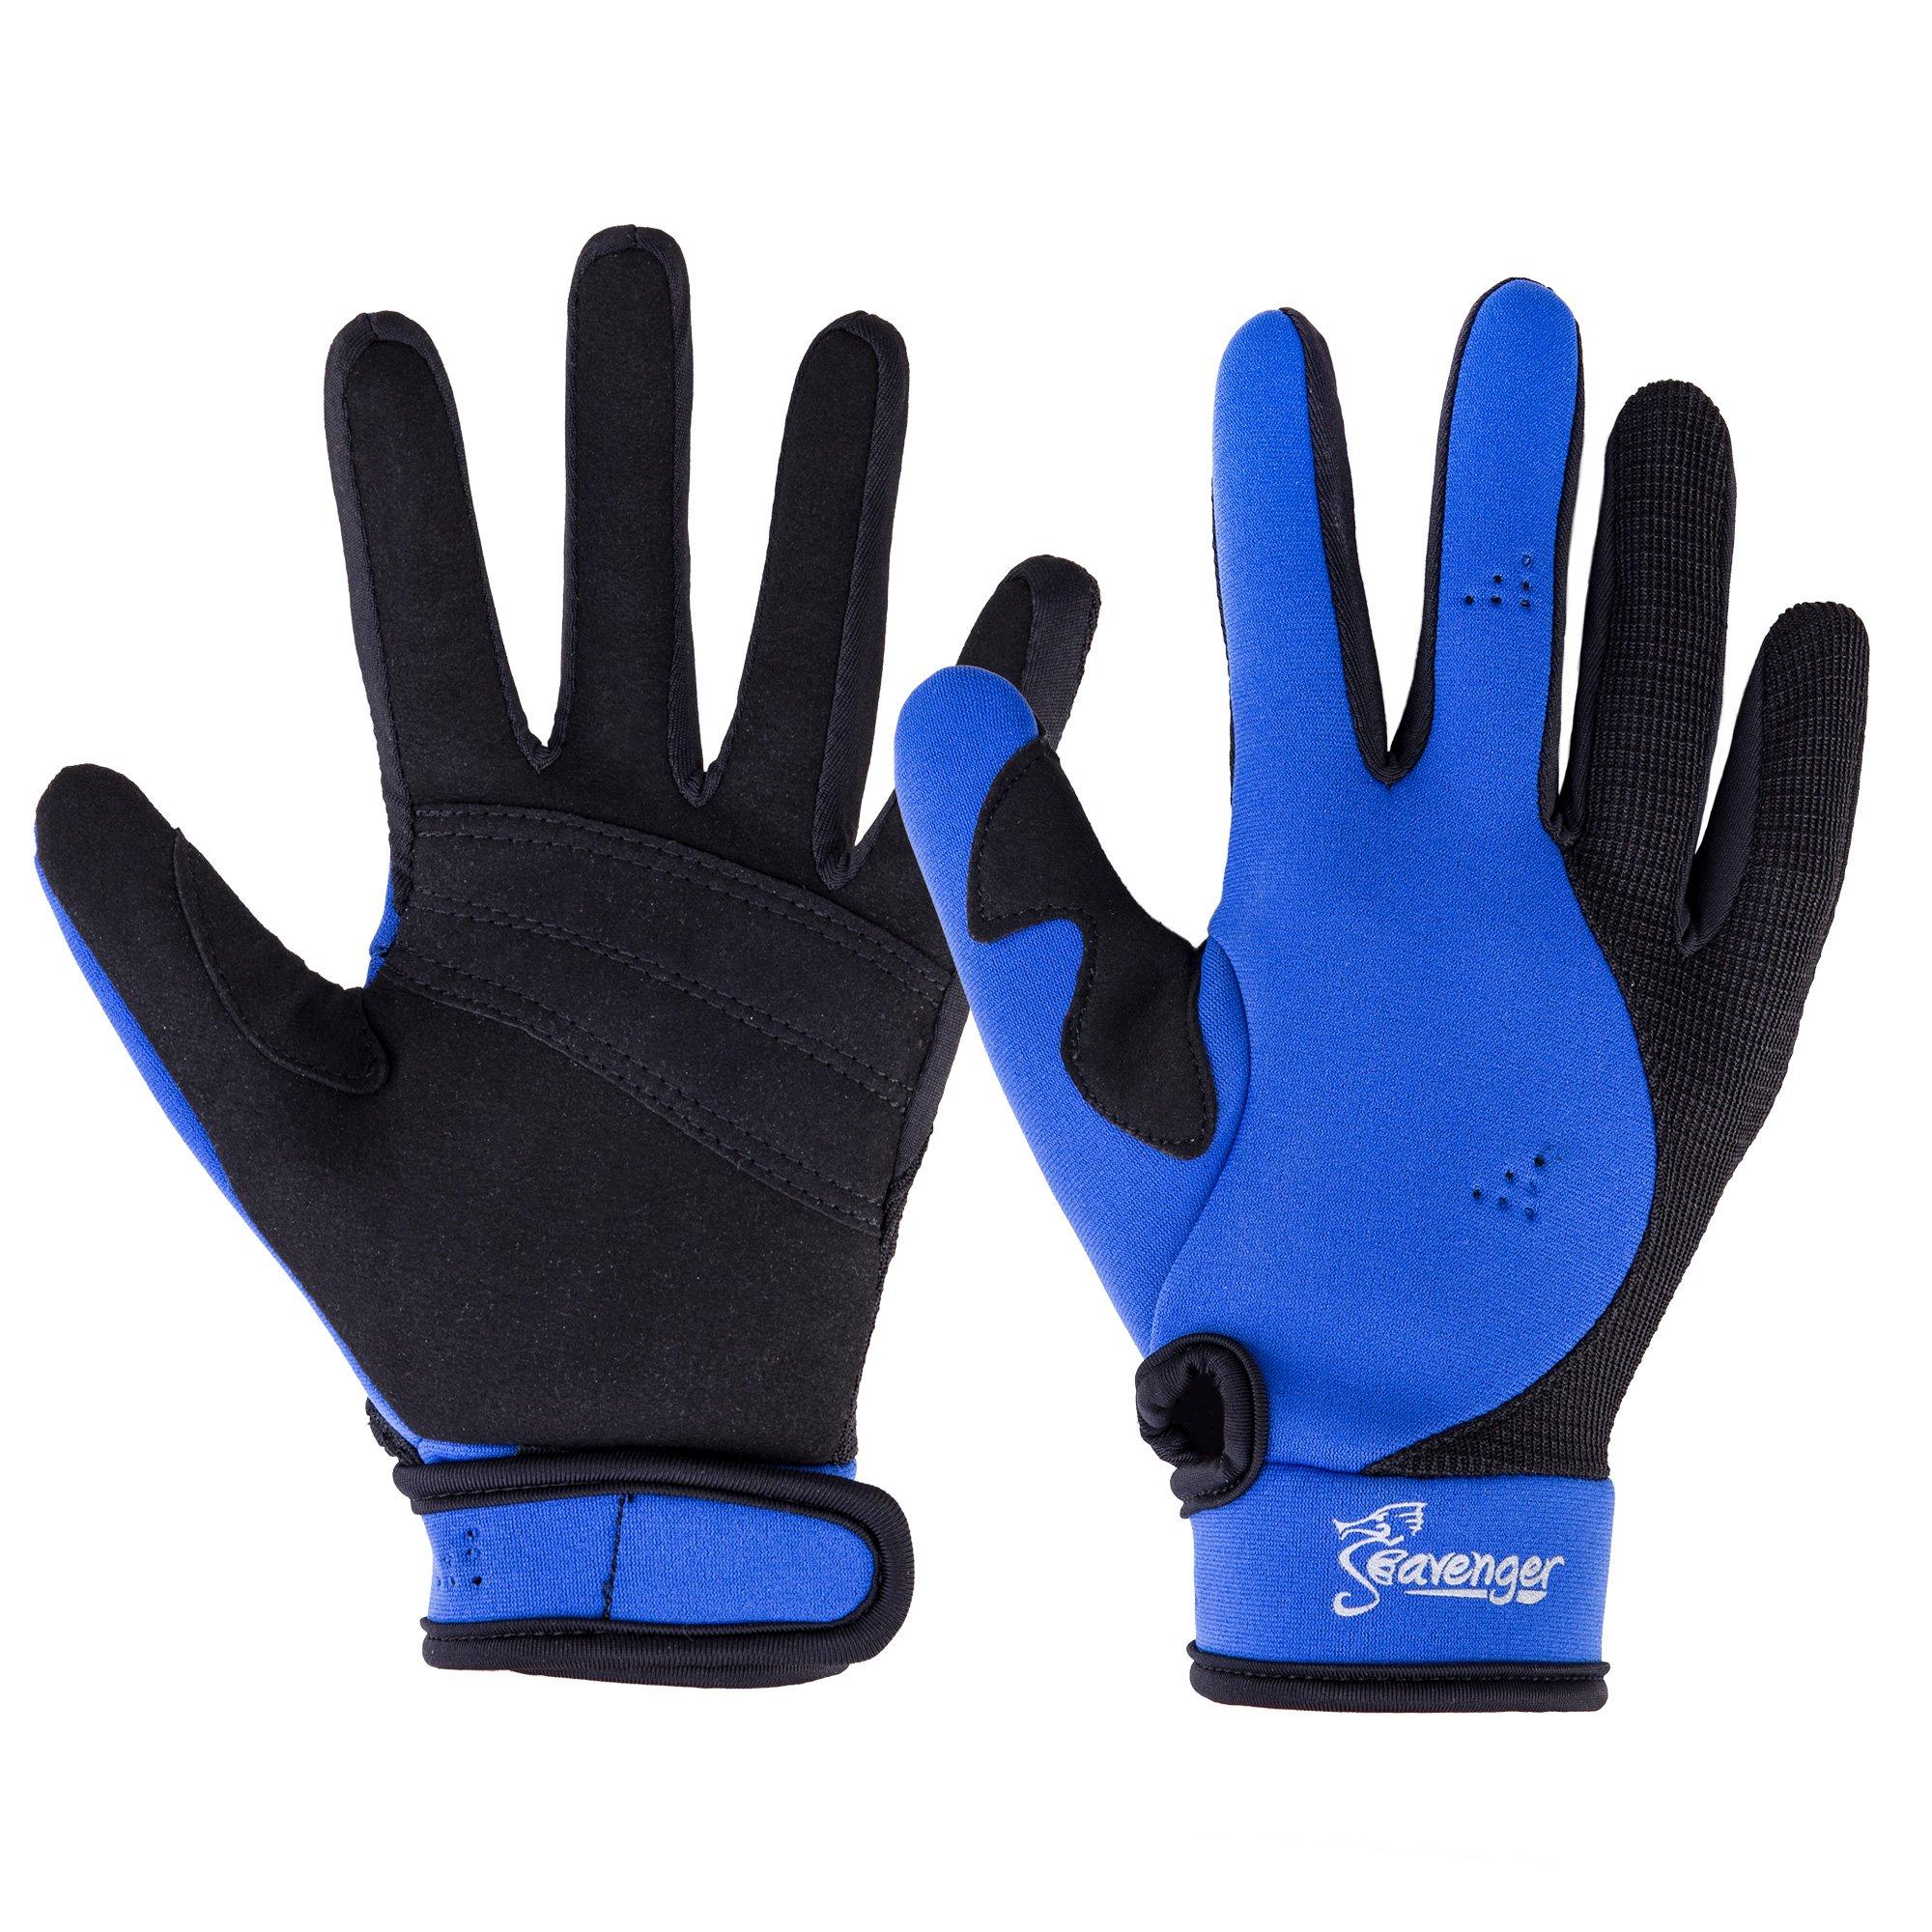 Seavenger Abyss Dive Gloves | 1.5mm Neoprene Mesh | Scuba Diving, Wakeboarding, Spearfishing (Blue, X-Large) by Seavenger